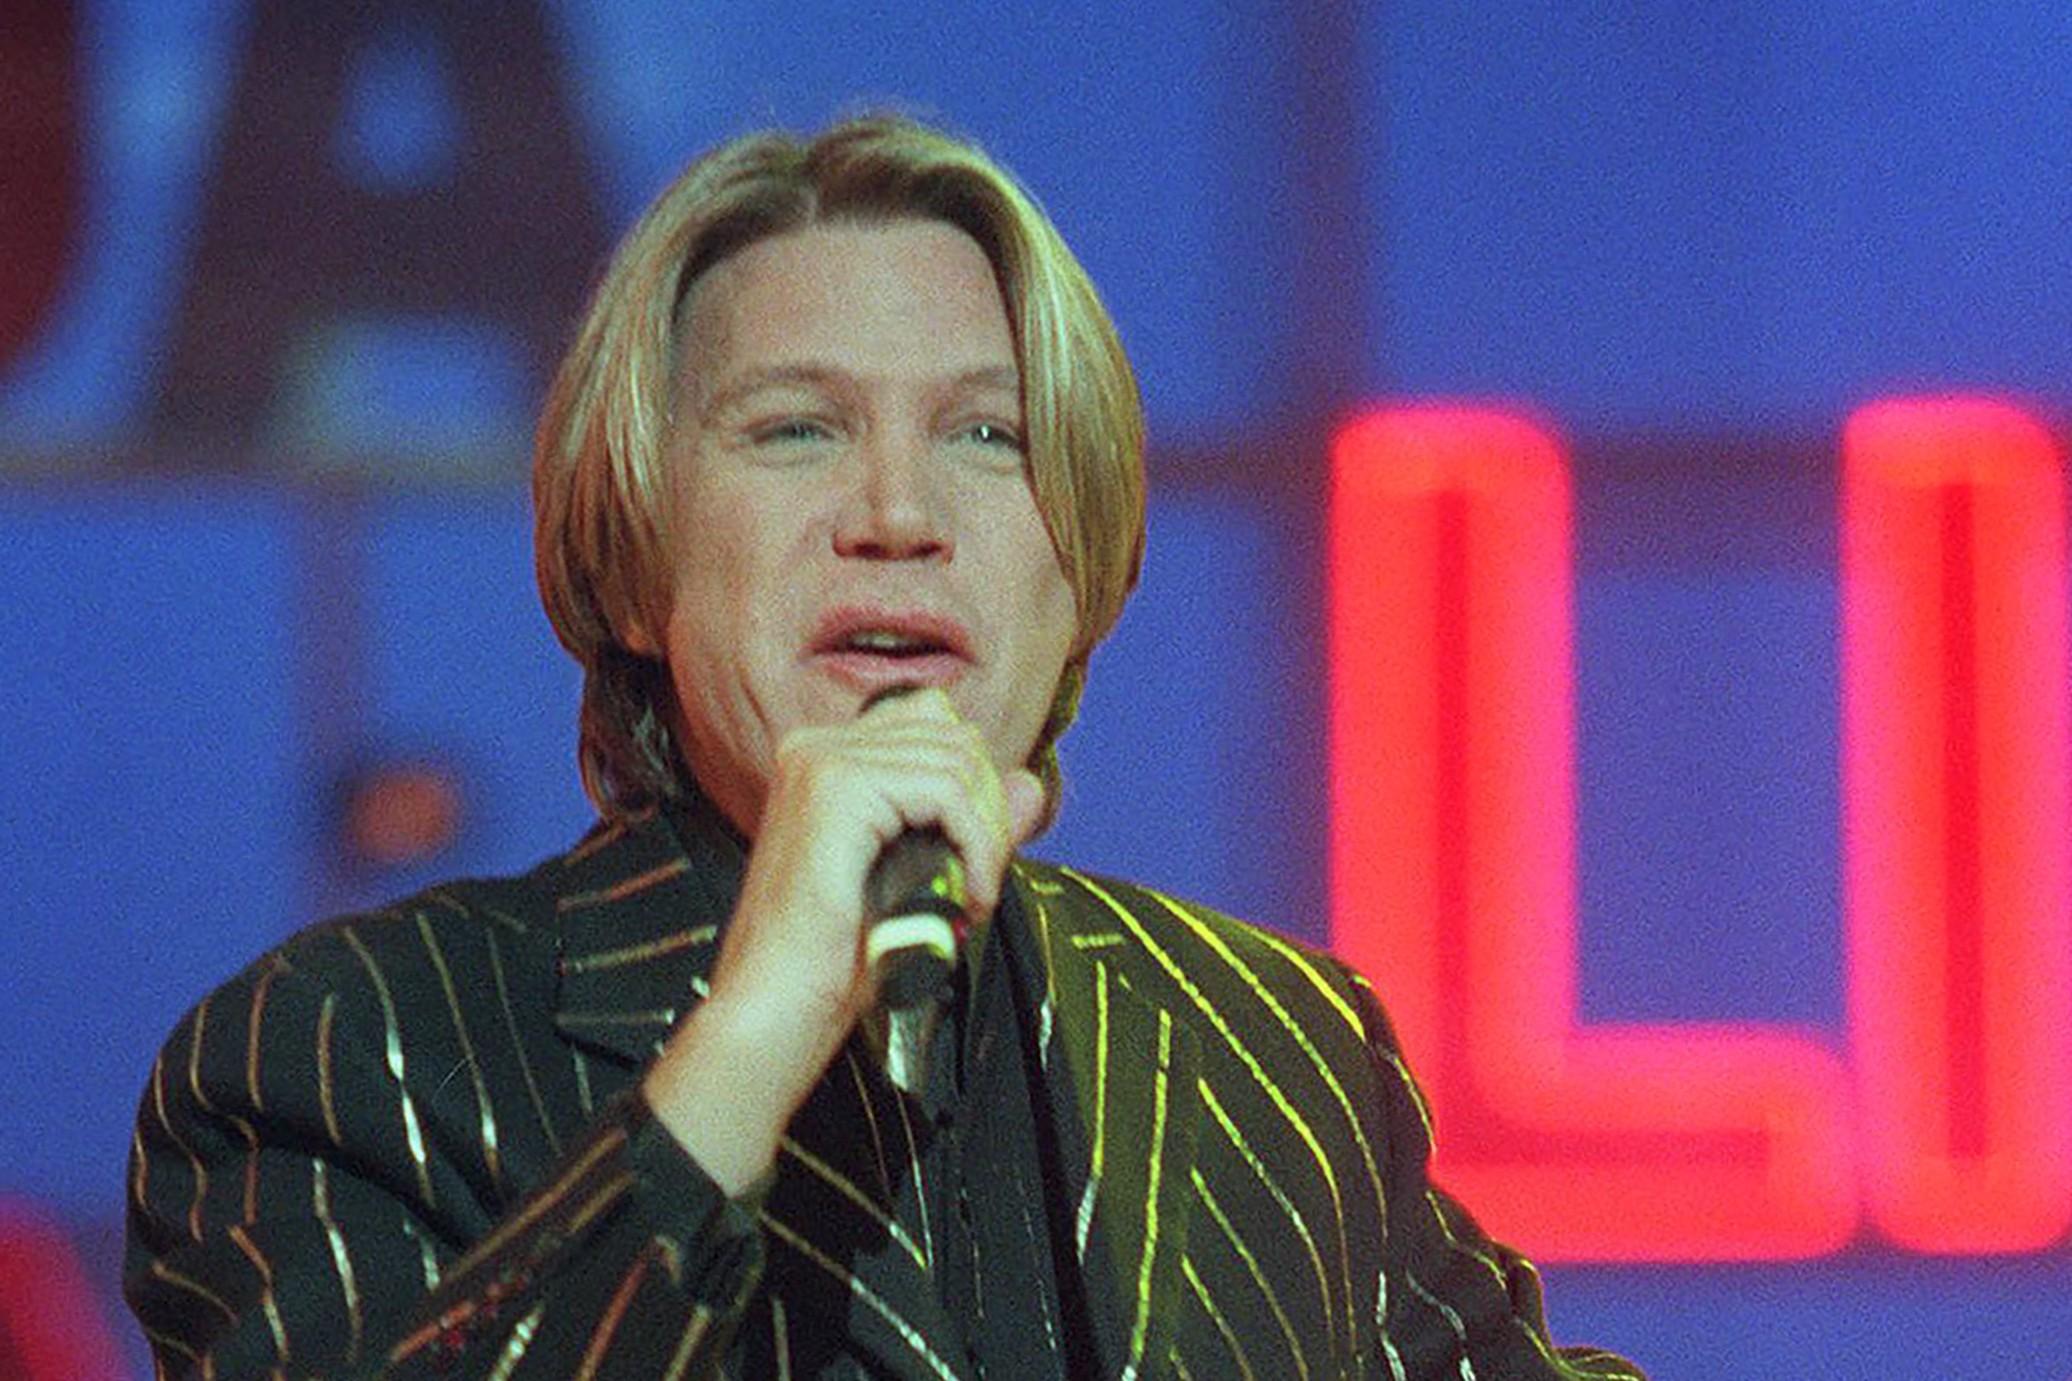 Patrick Juvet, cantor suíço do hit disco 'Où sont les femmes?', morre aos 70 anos